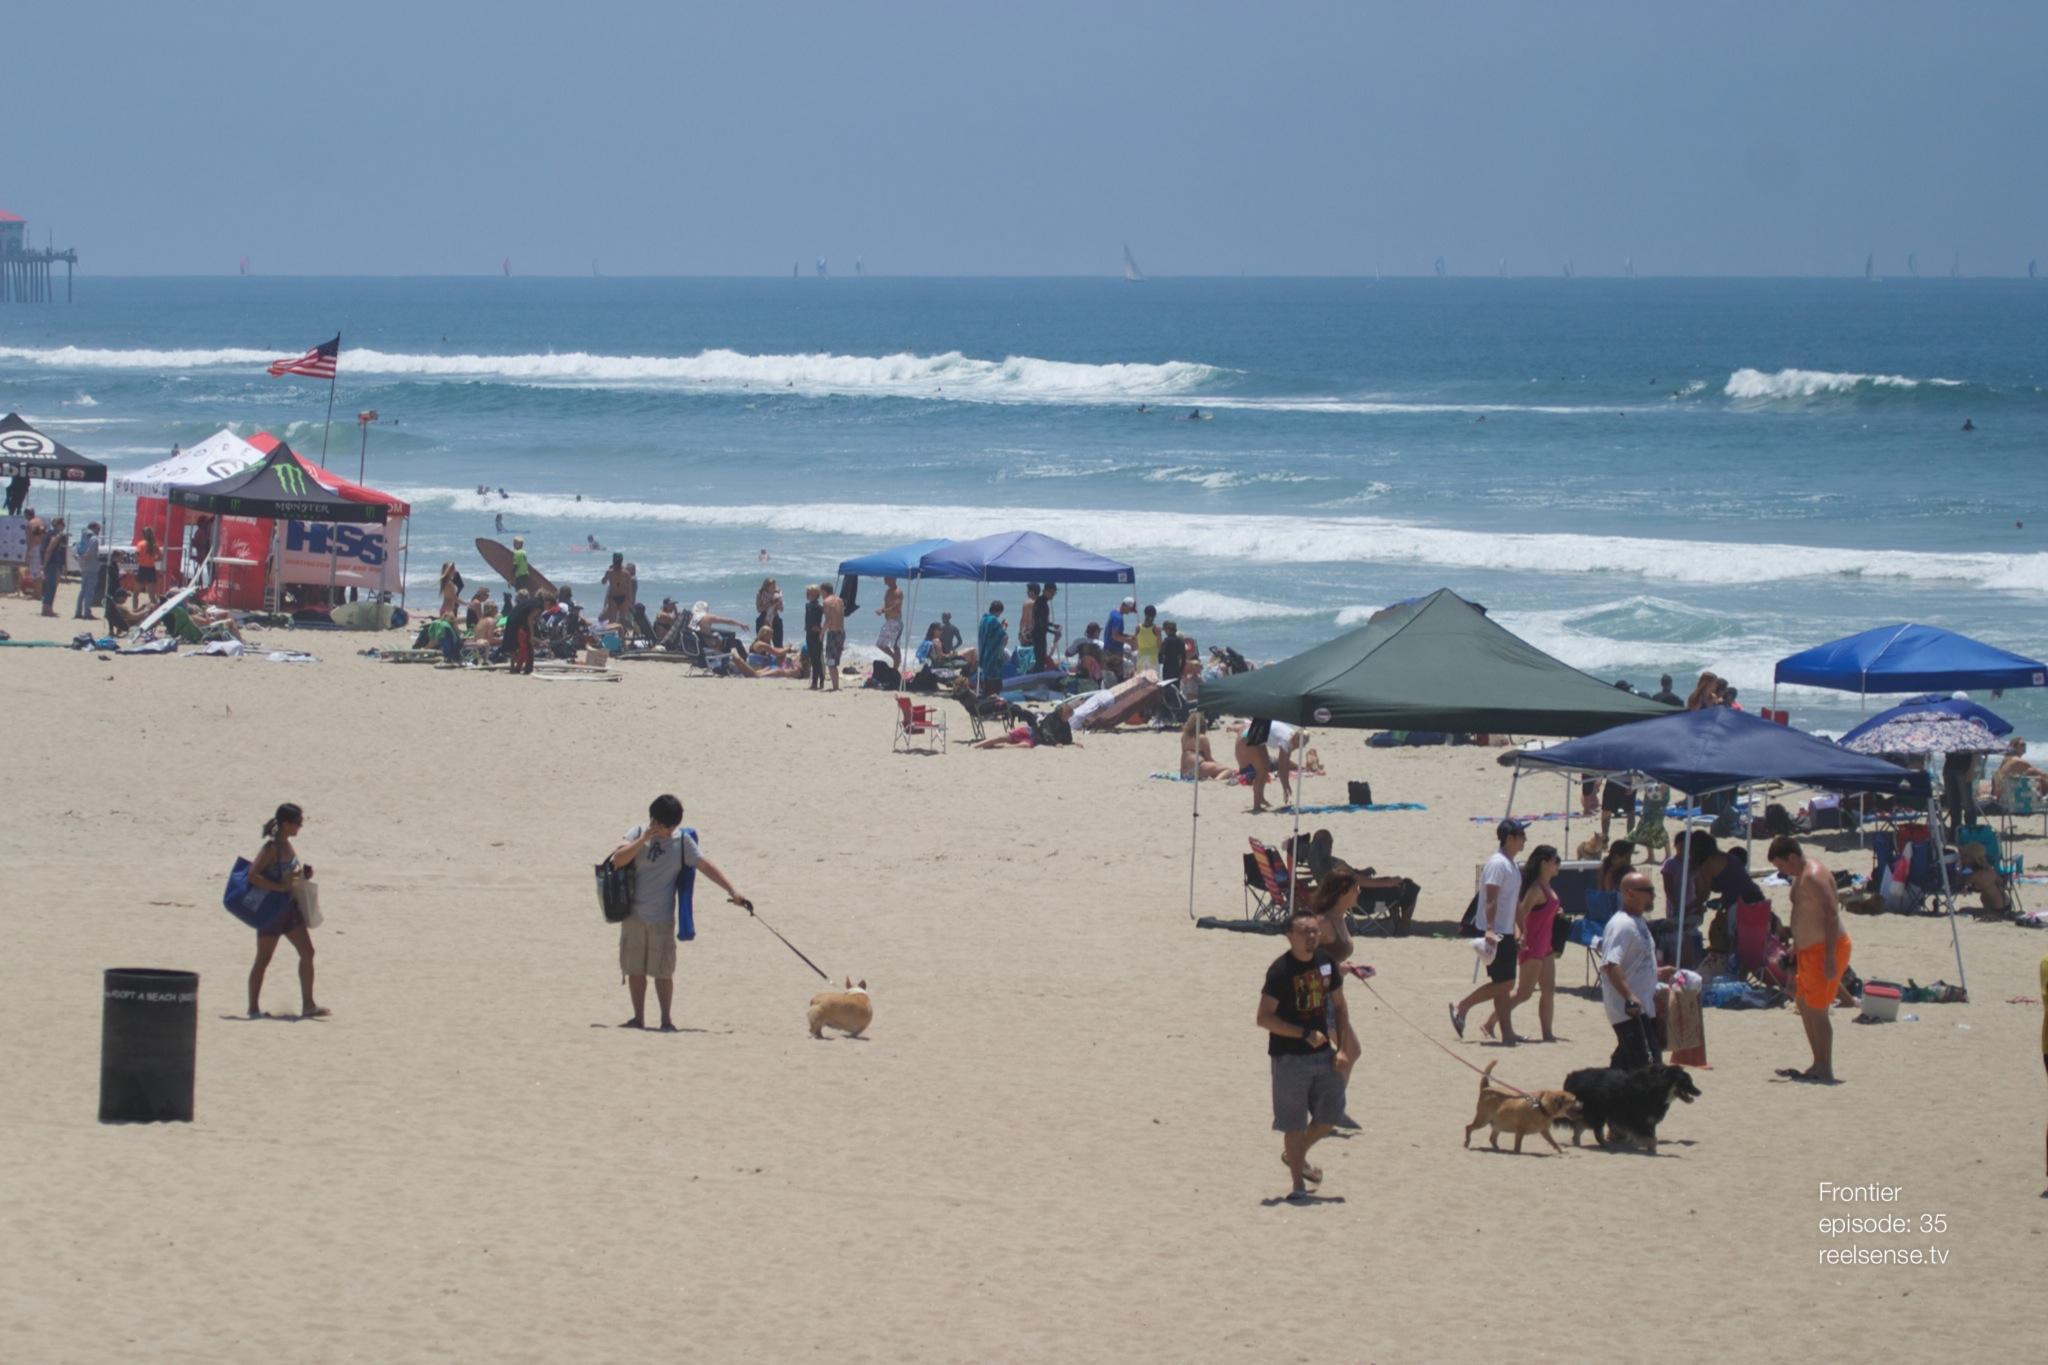 Huntington Dog Beach - Corgi Day 2013 beach front